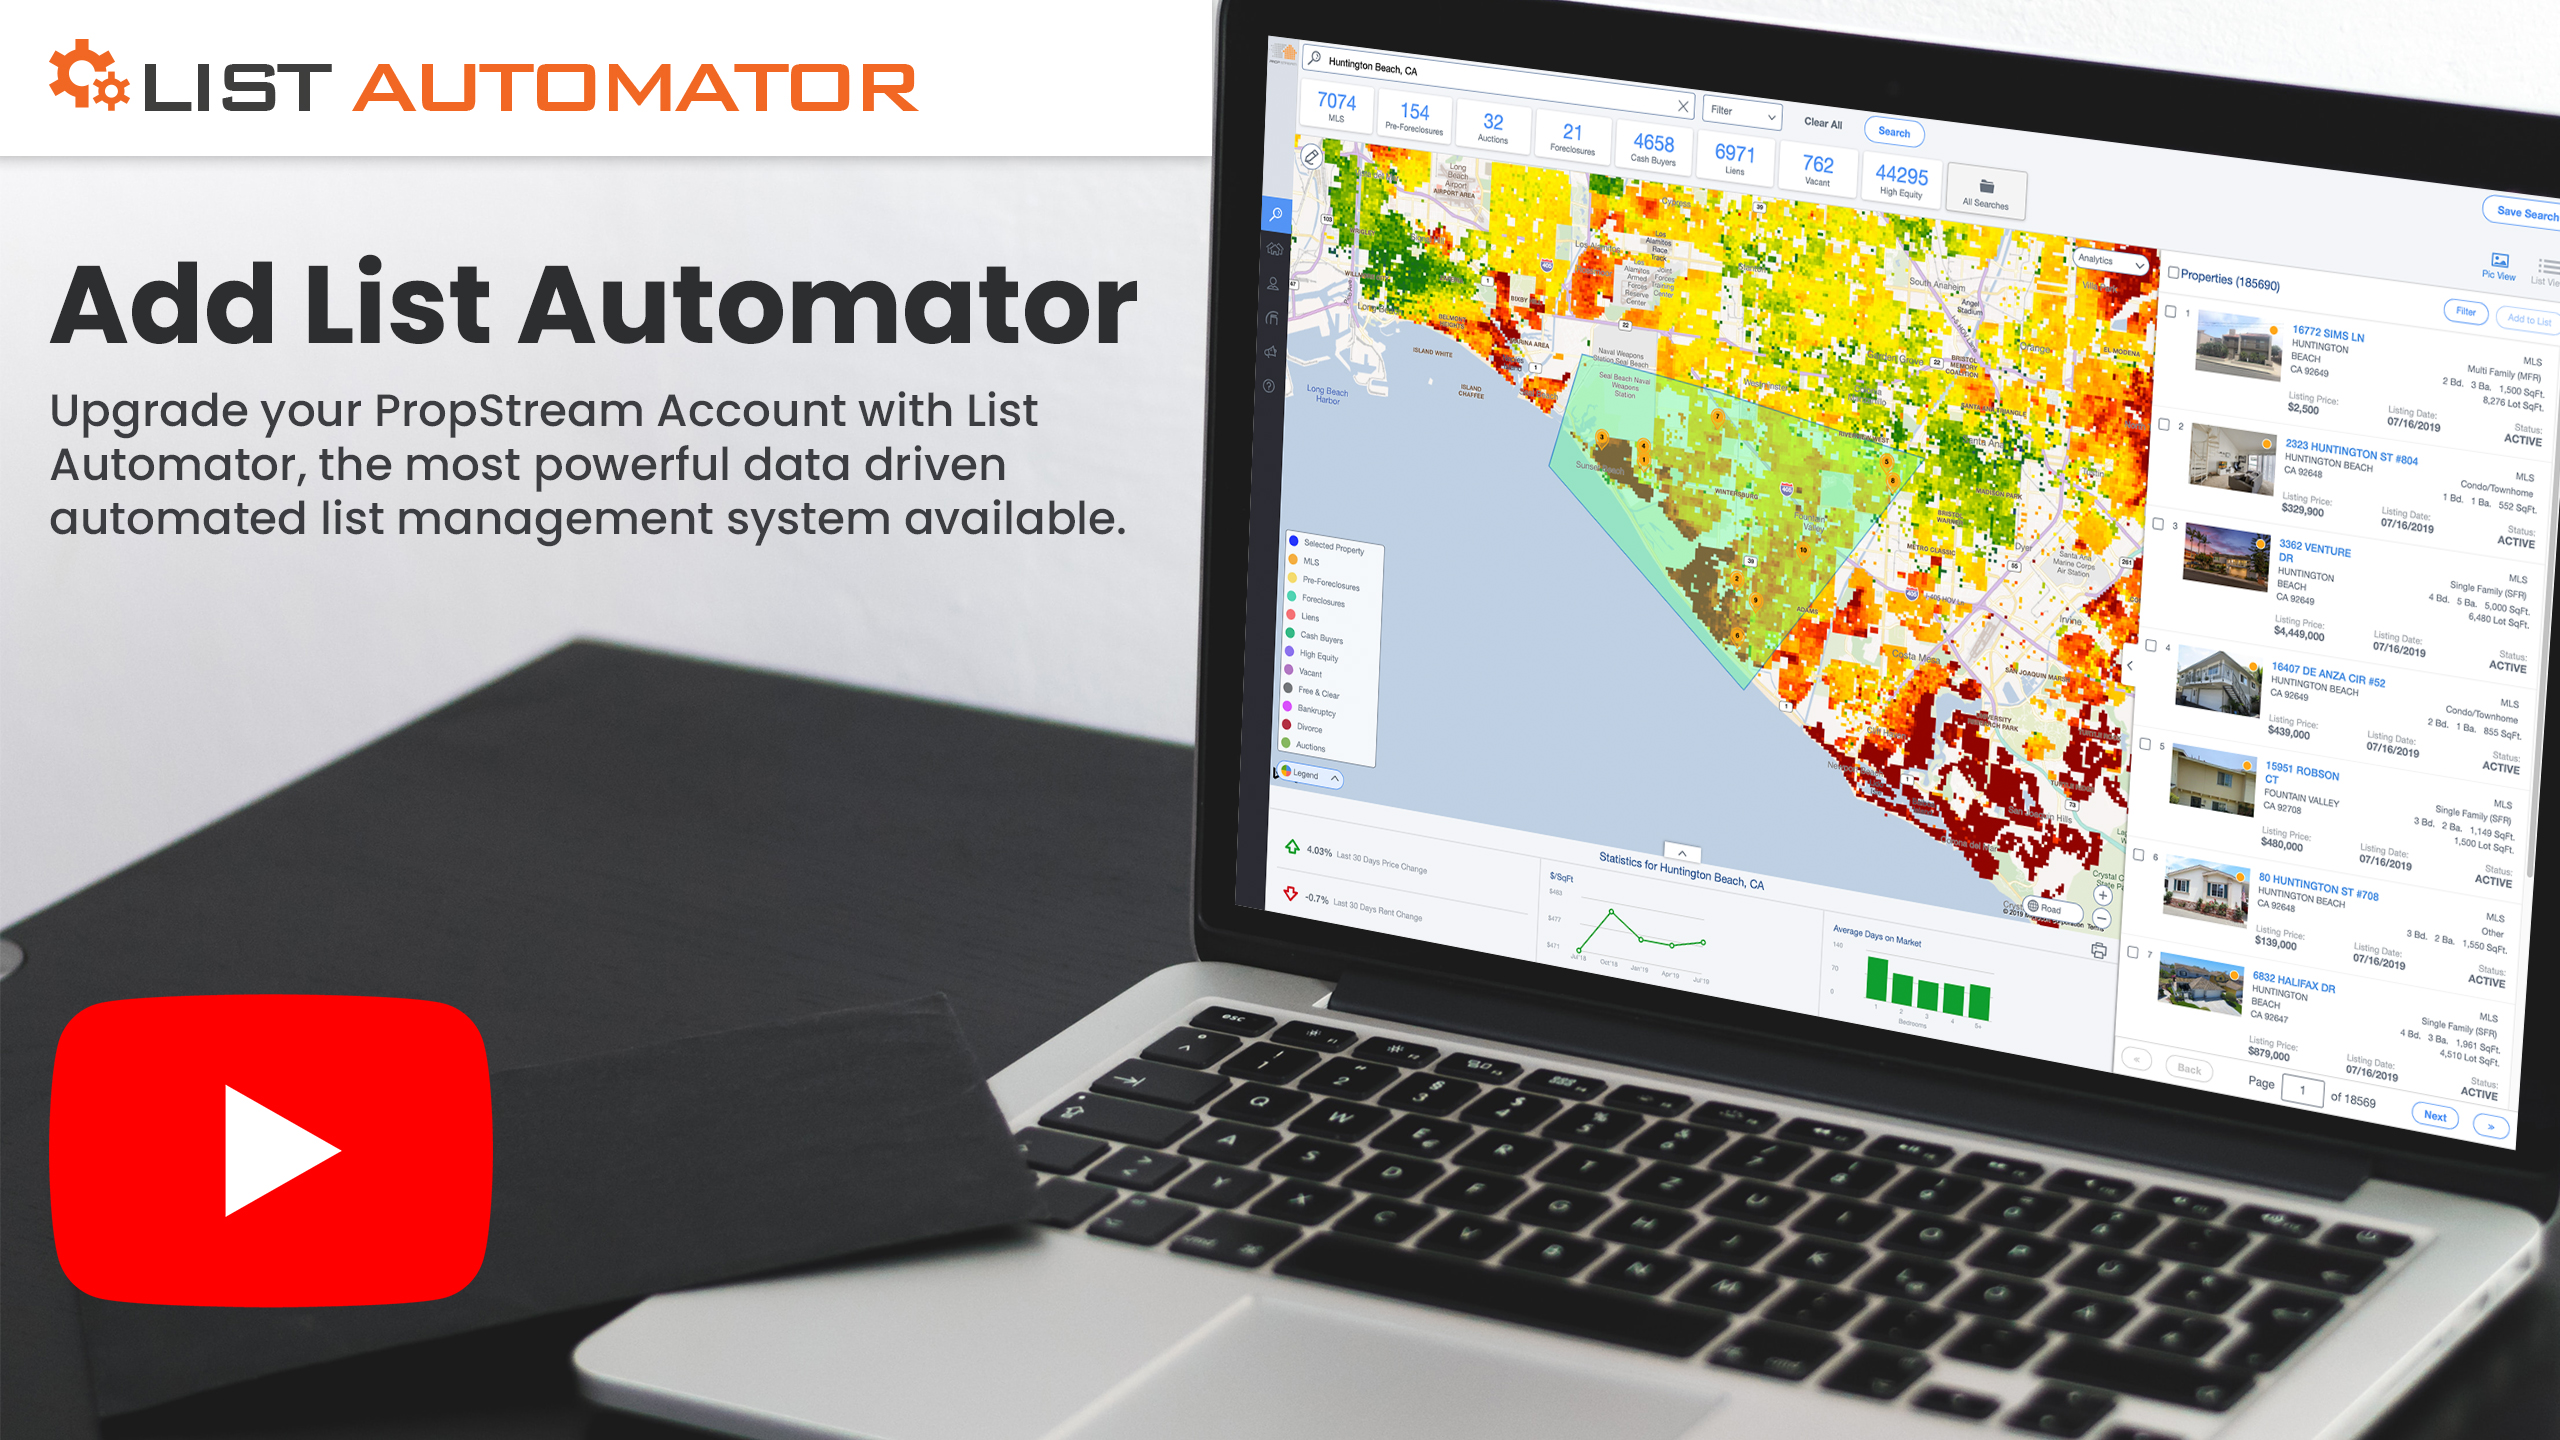 Adding List Automator